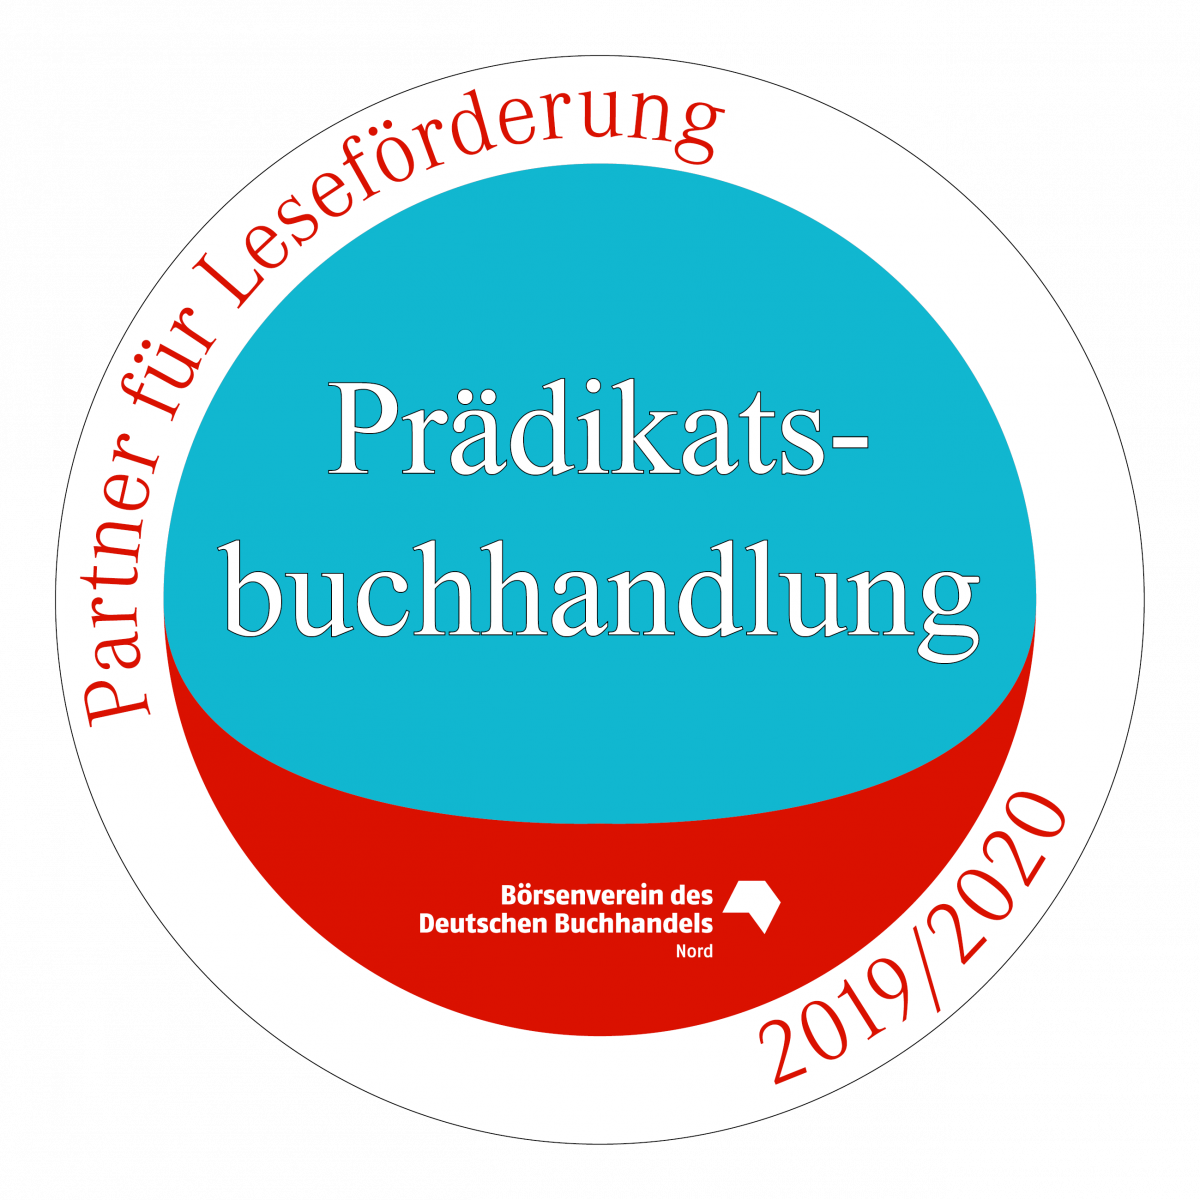 logo_praedikatsbuchhandlungrand_0.png